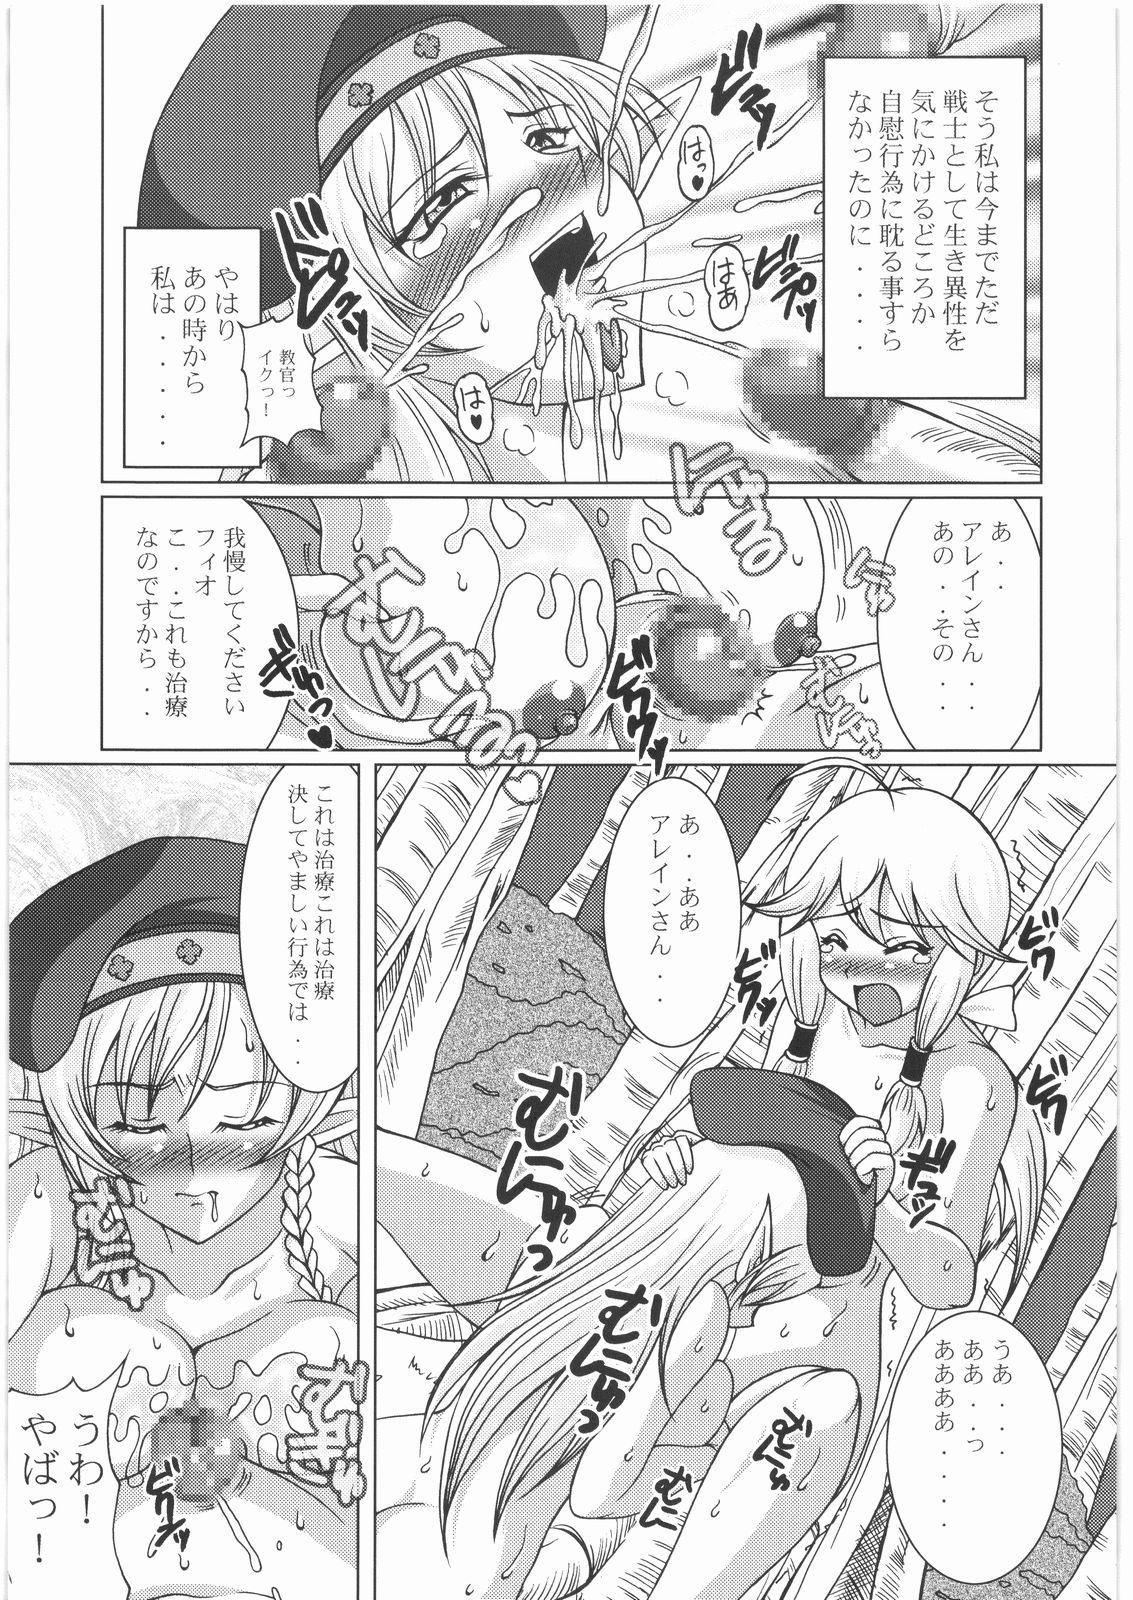 Strike Kyoukan 5